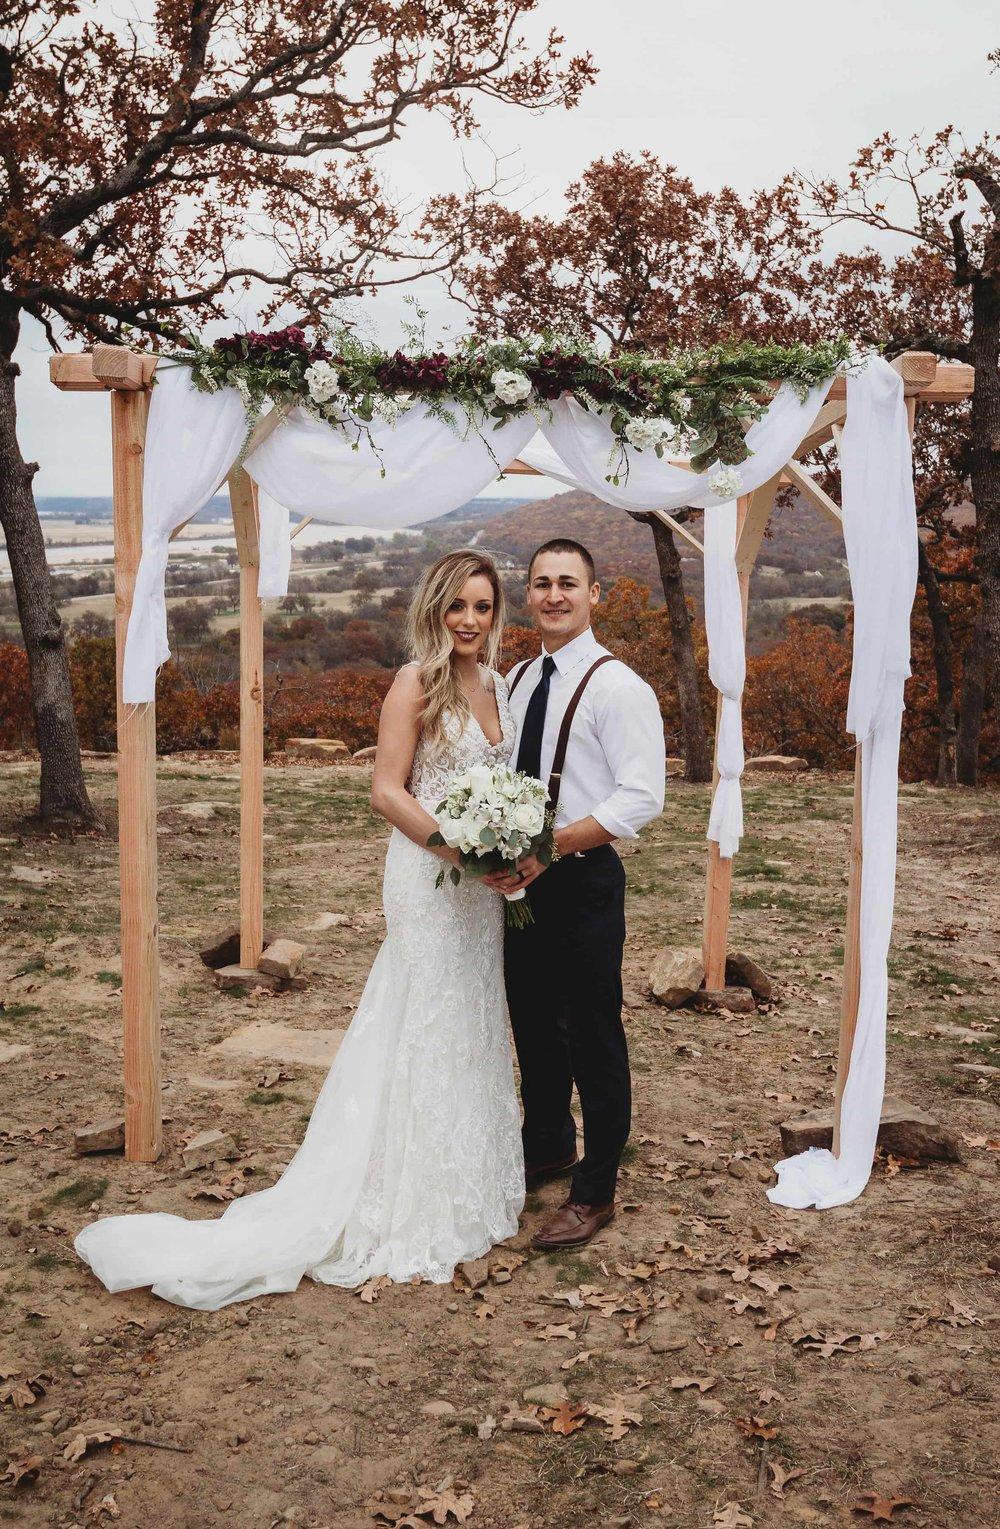 Outdoor Wedding Venue Tulsa 11-min.jpg